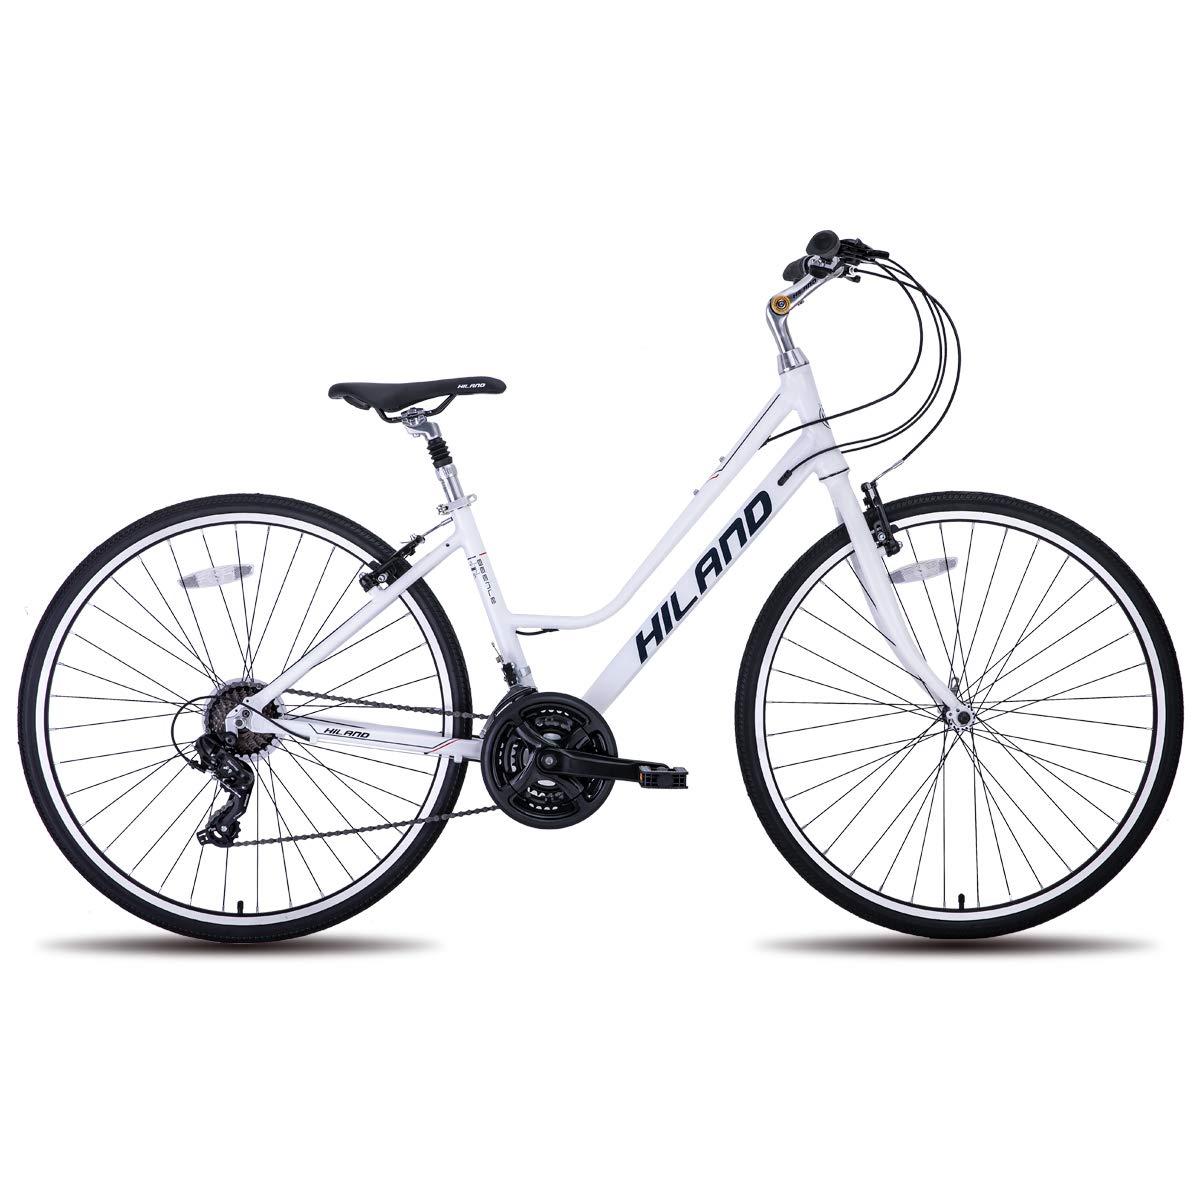 Hiland Aluminum Comfort Commuter Bicycle